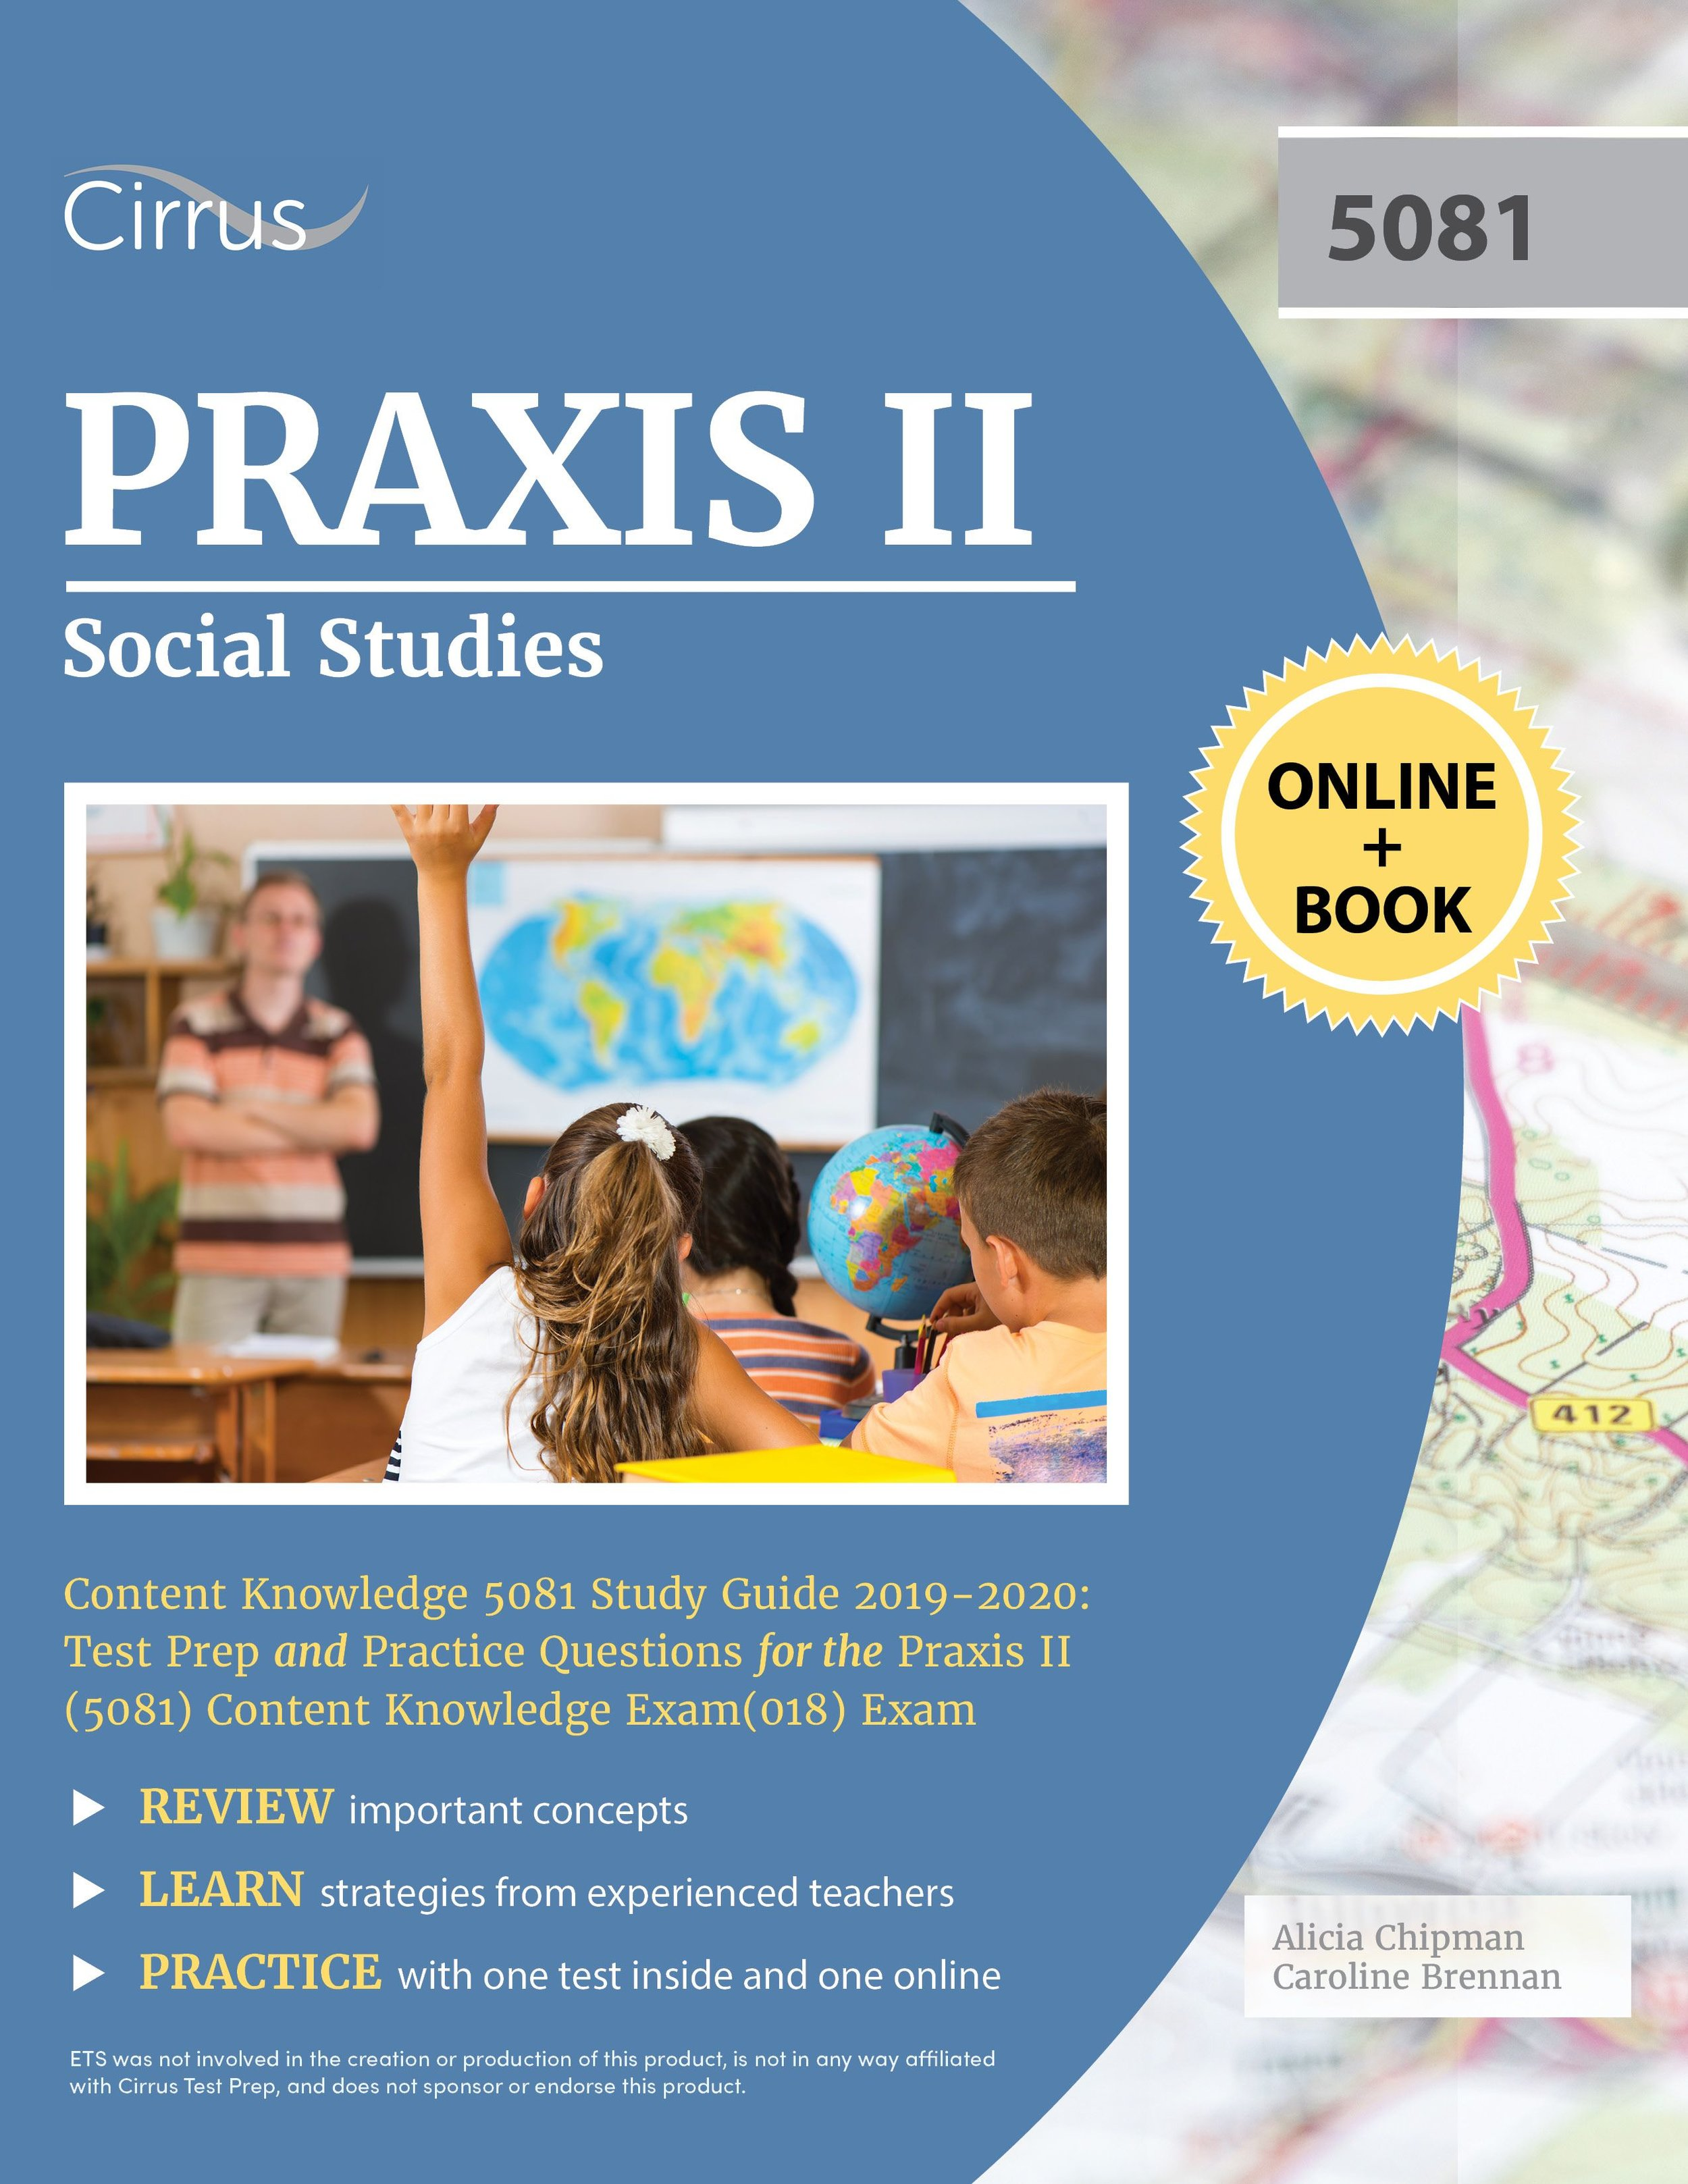 praxis_5081_cvr_website-compressor.jpg